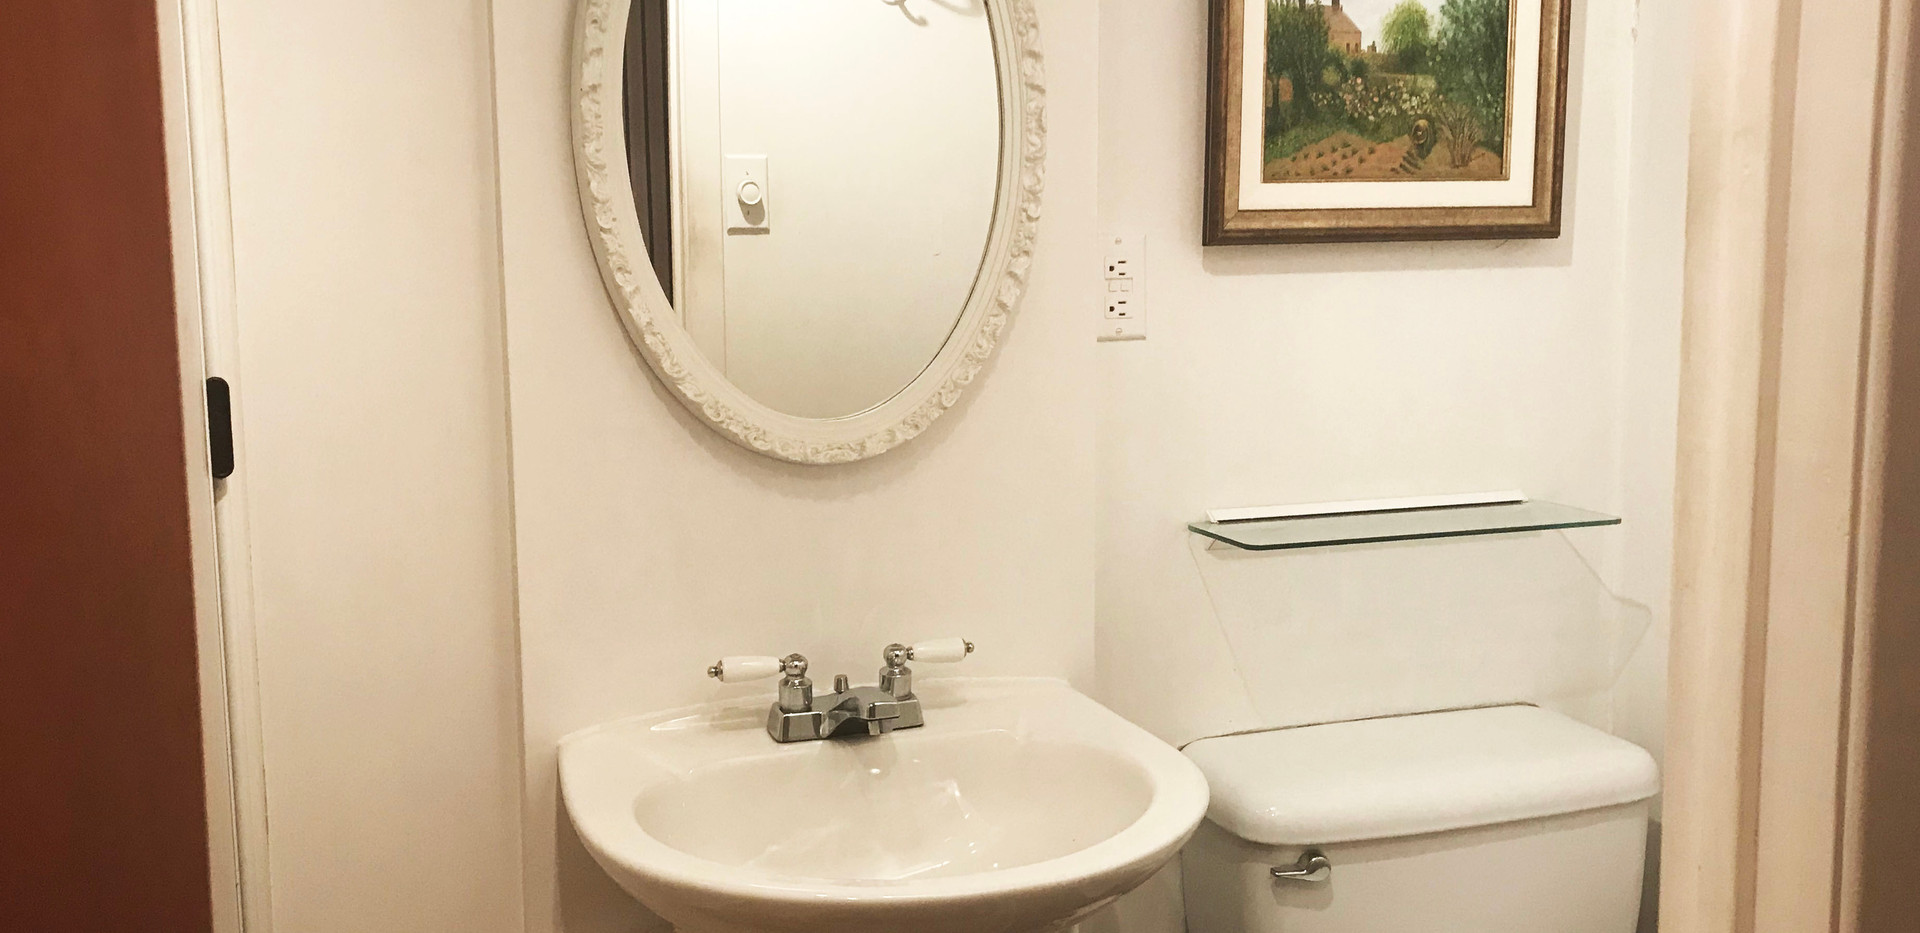 salle de bain sous-sol.jpg